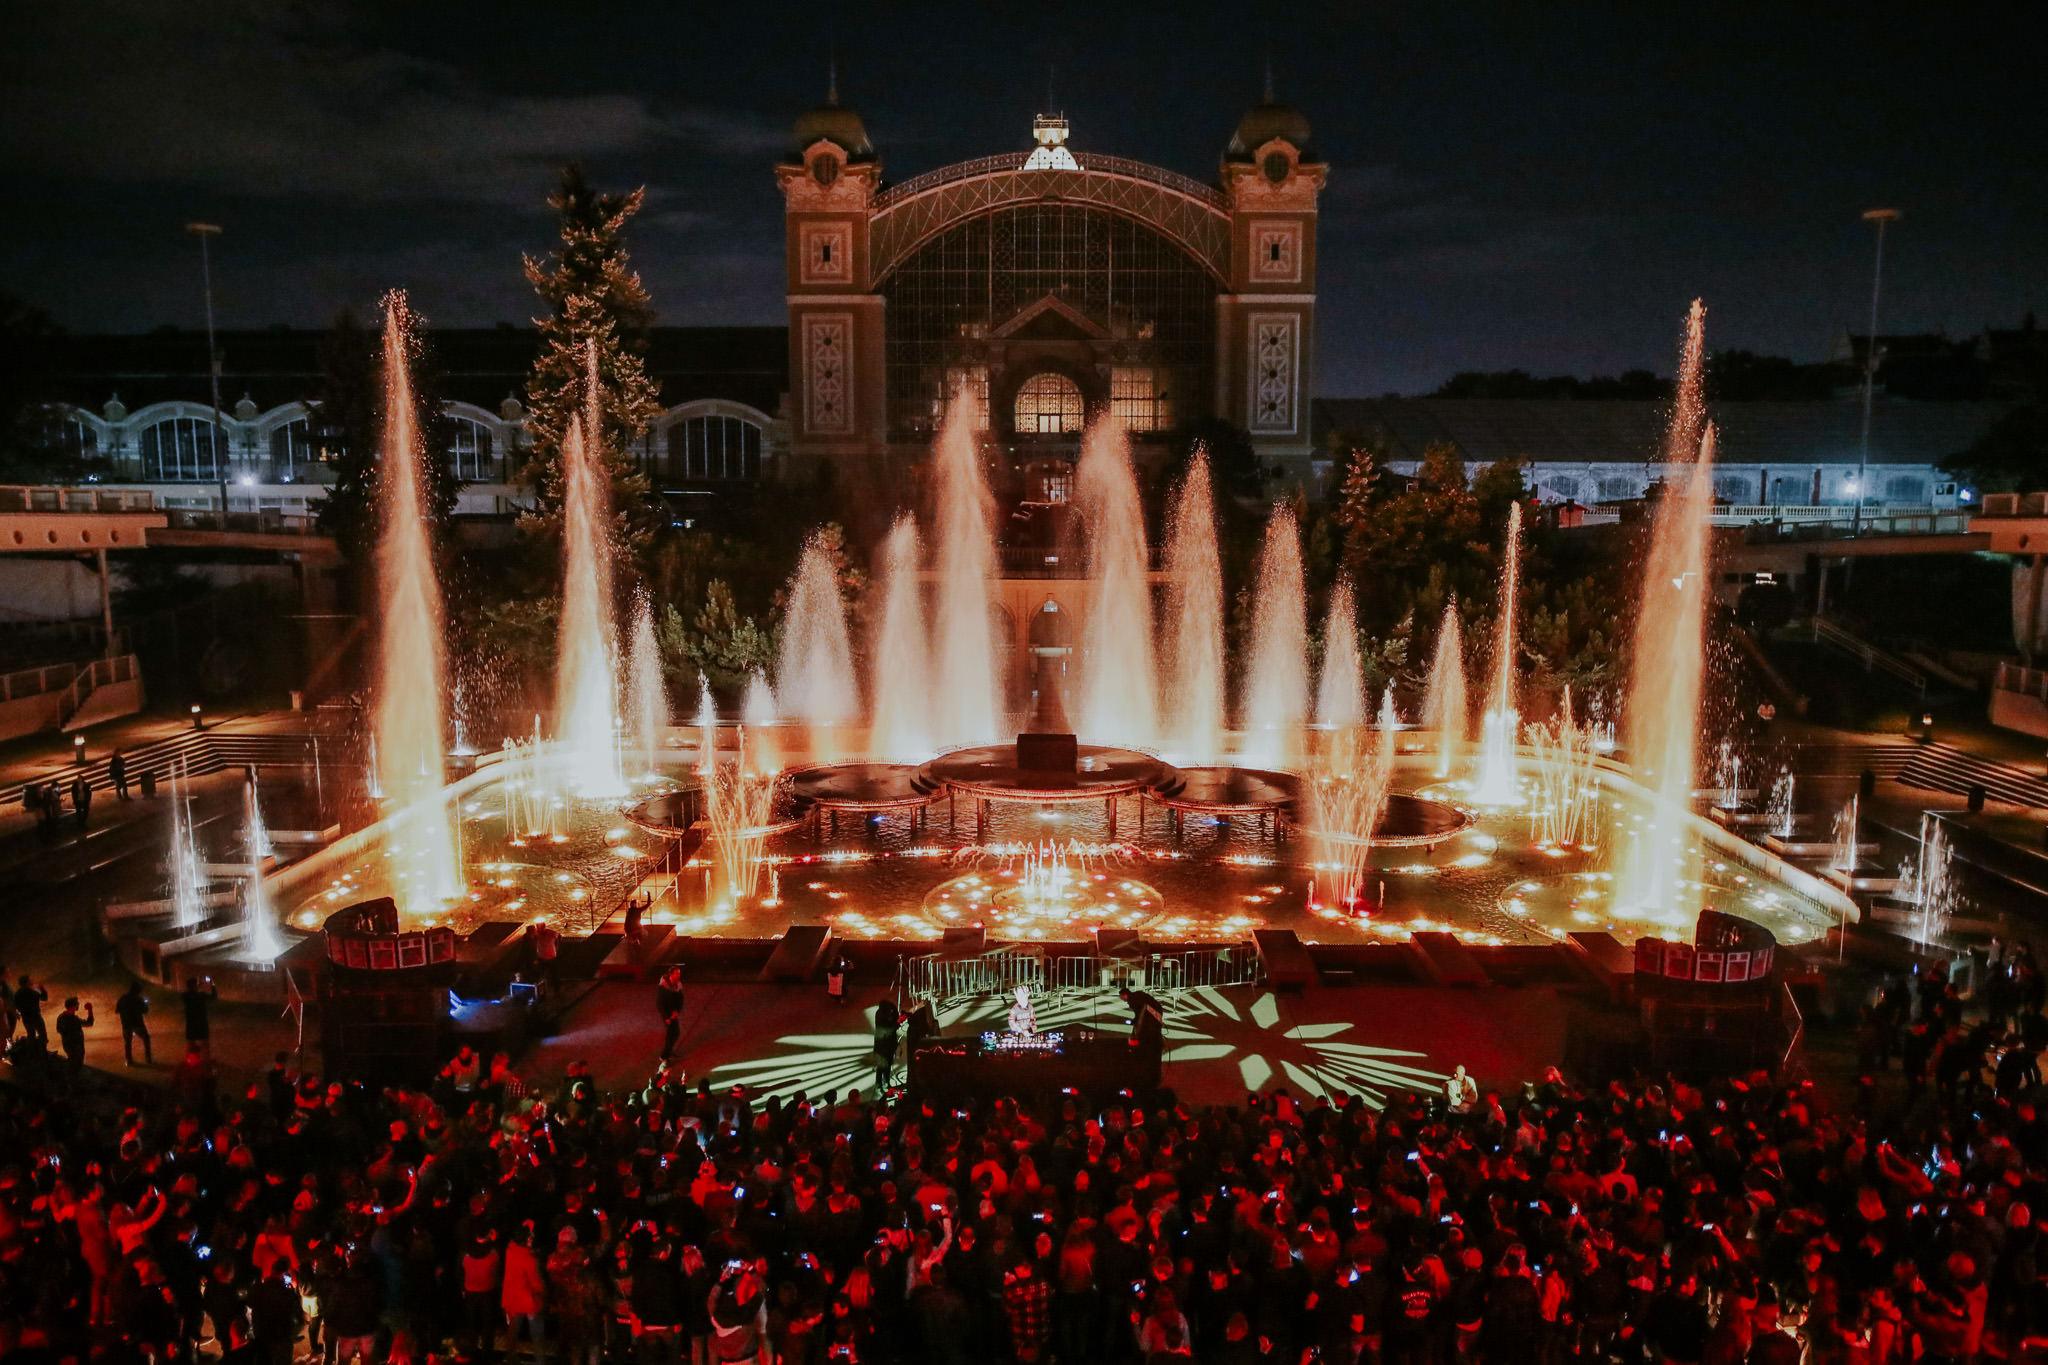 Krizikova Fontana - 17.09.2017 Prague (Czech Republic)